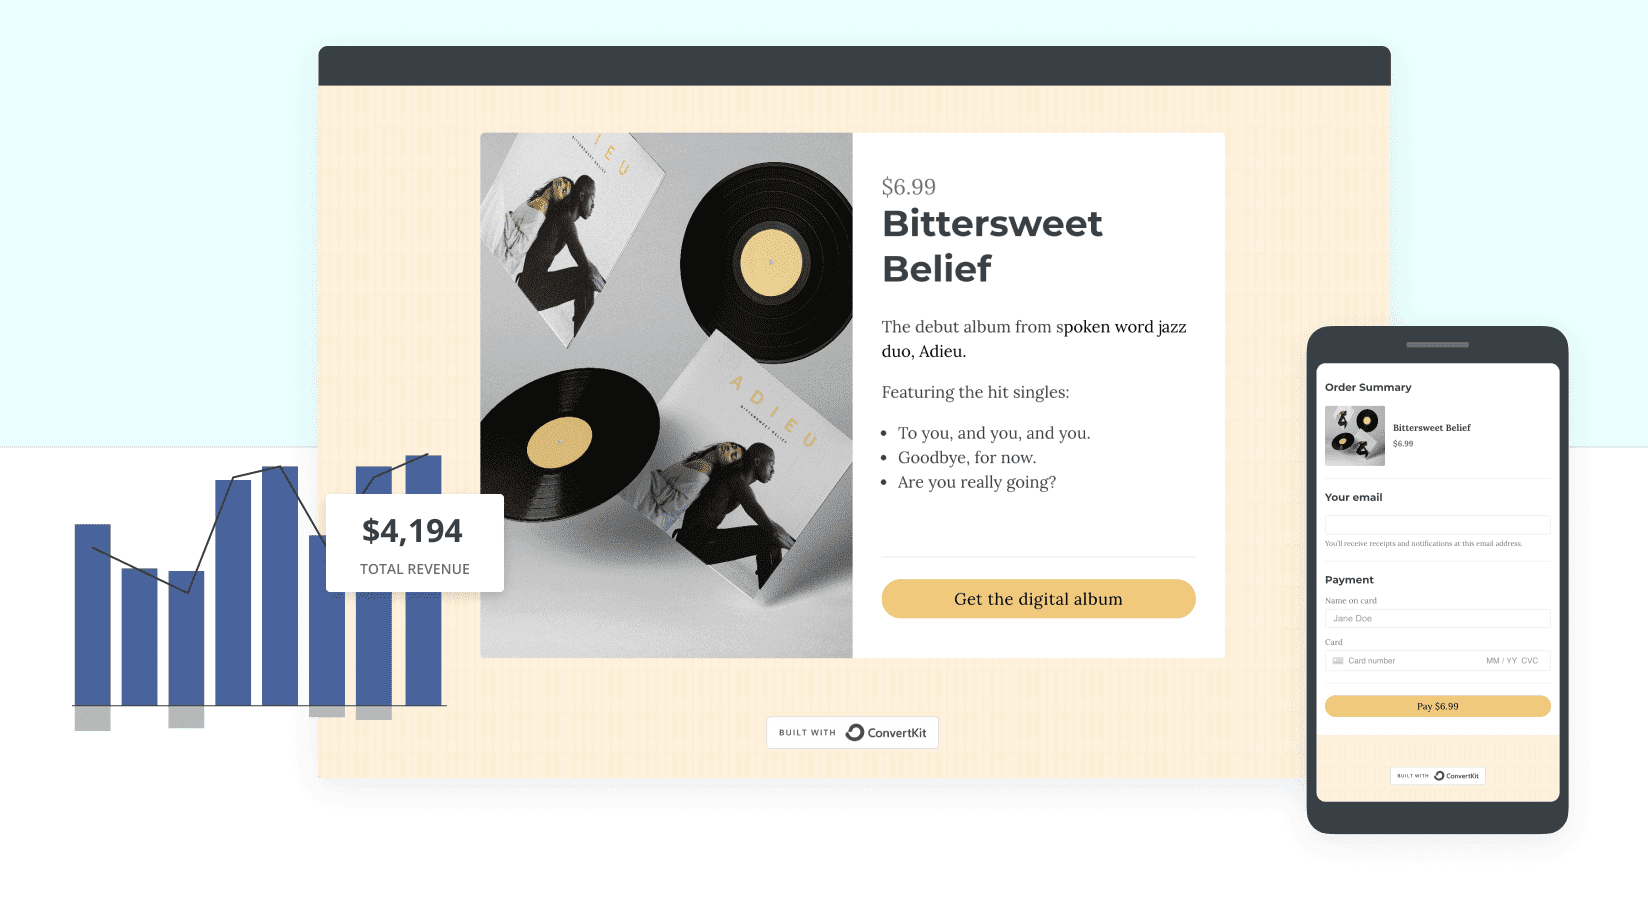 ConvertKit's e-commerce tools